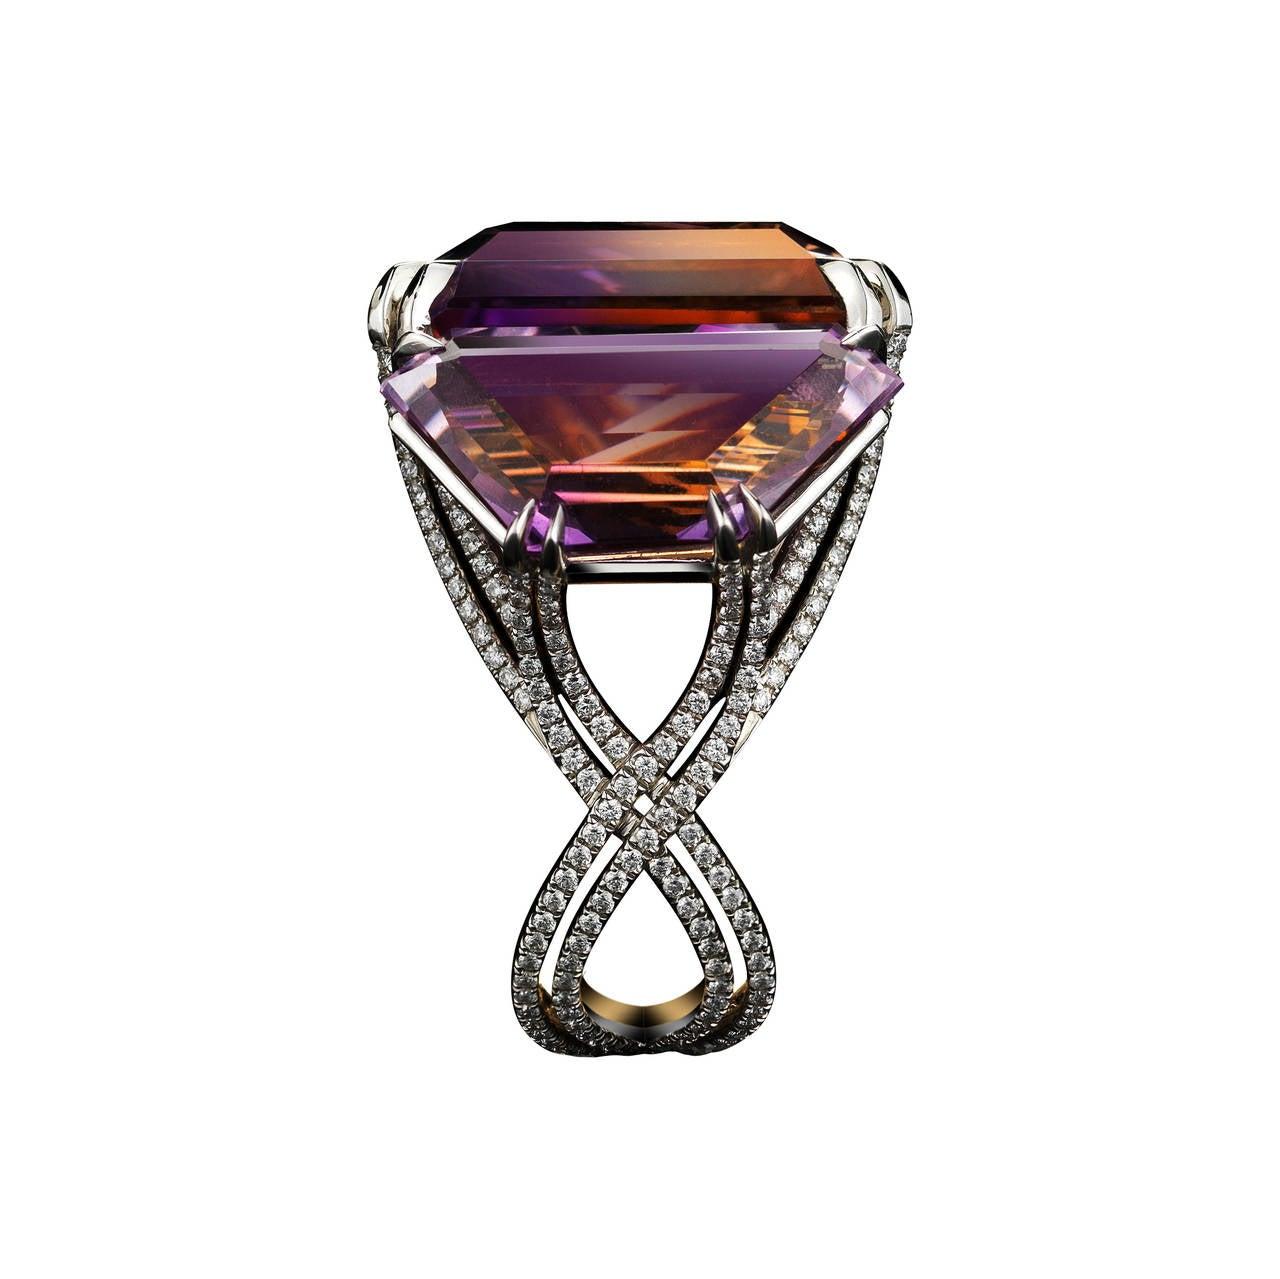 Contemporary Alexandra Mor Asymmetrical Bi-Color Ametrine and Diamond Ring For Sale